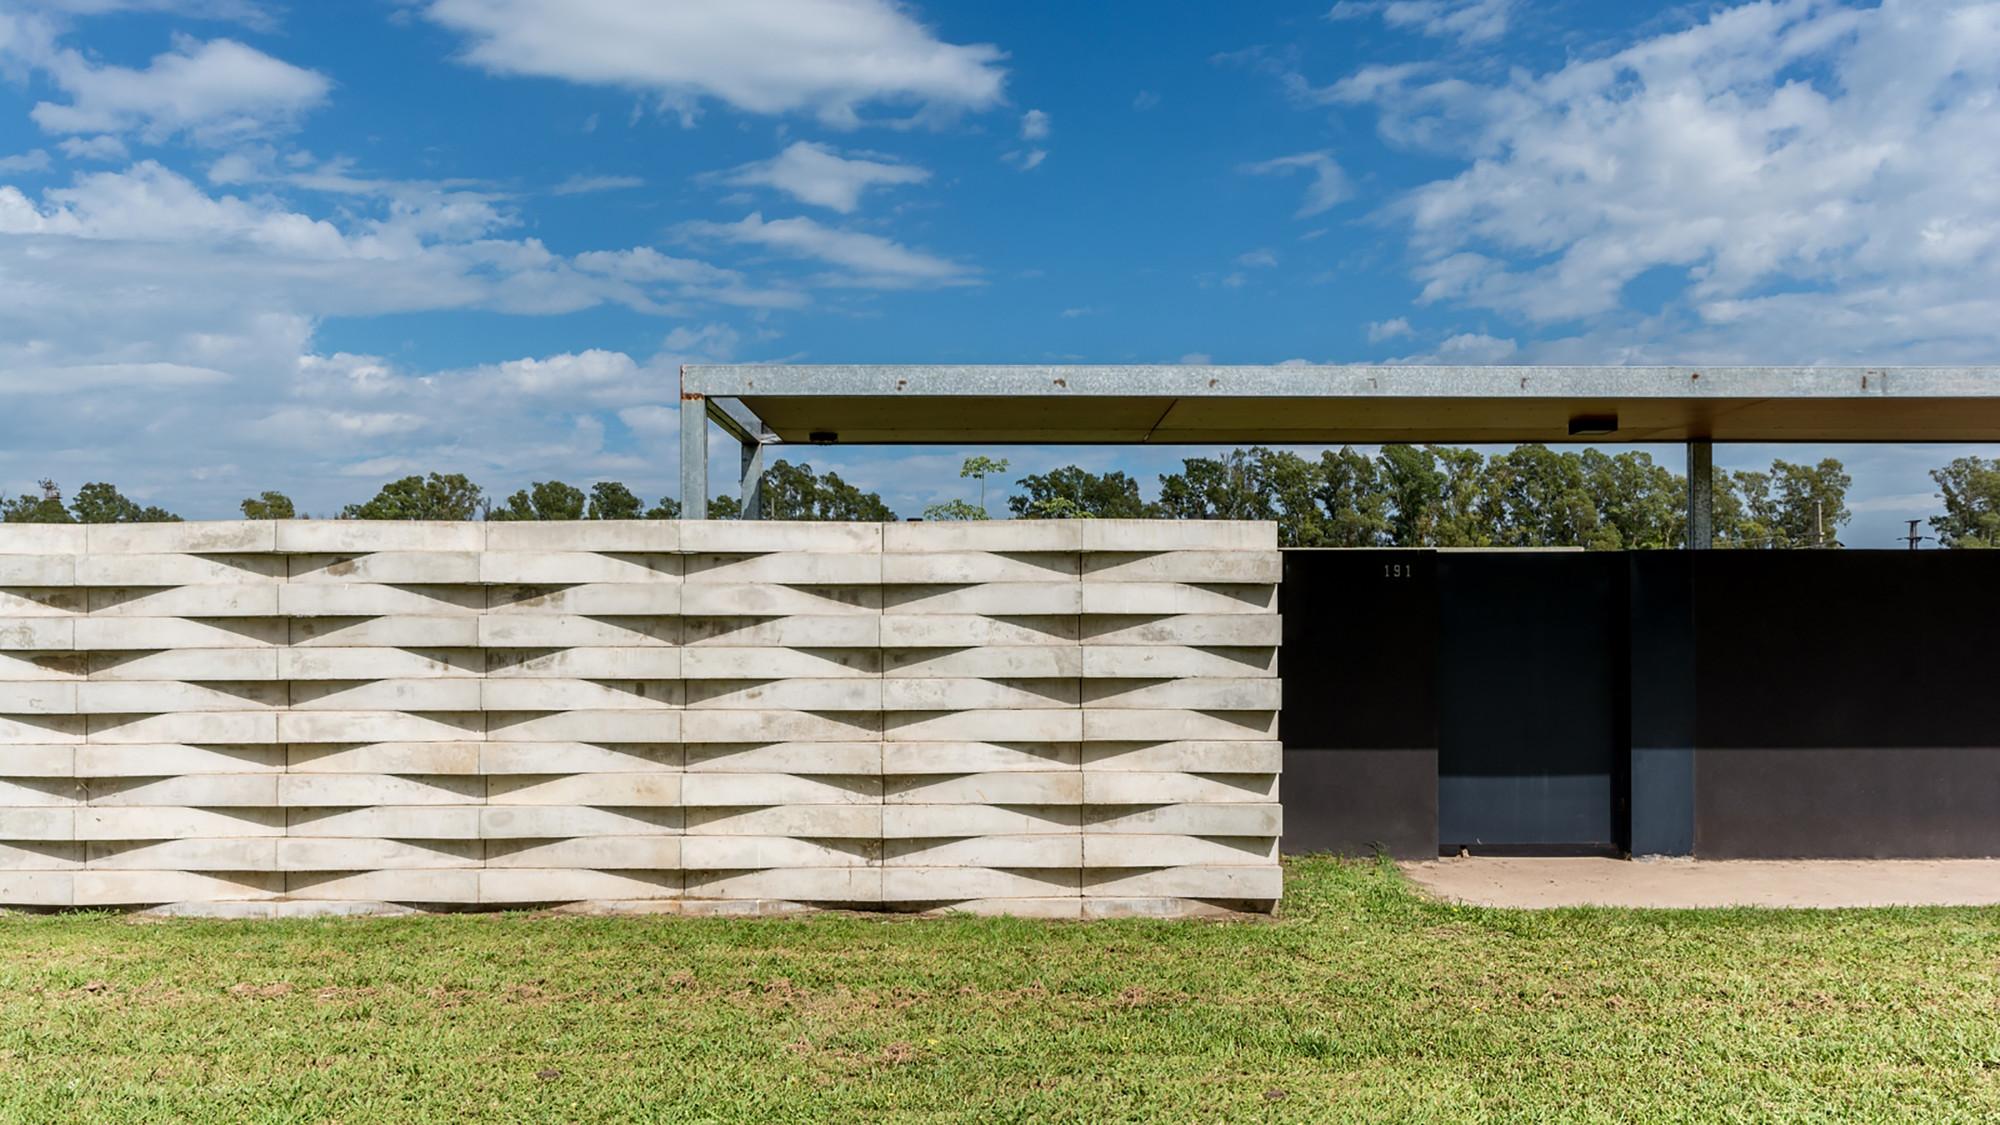 Suburban Dwelling / Roberto Benito, © Gonzalo Viramonte